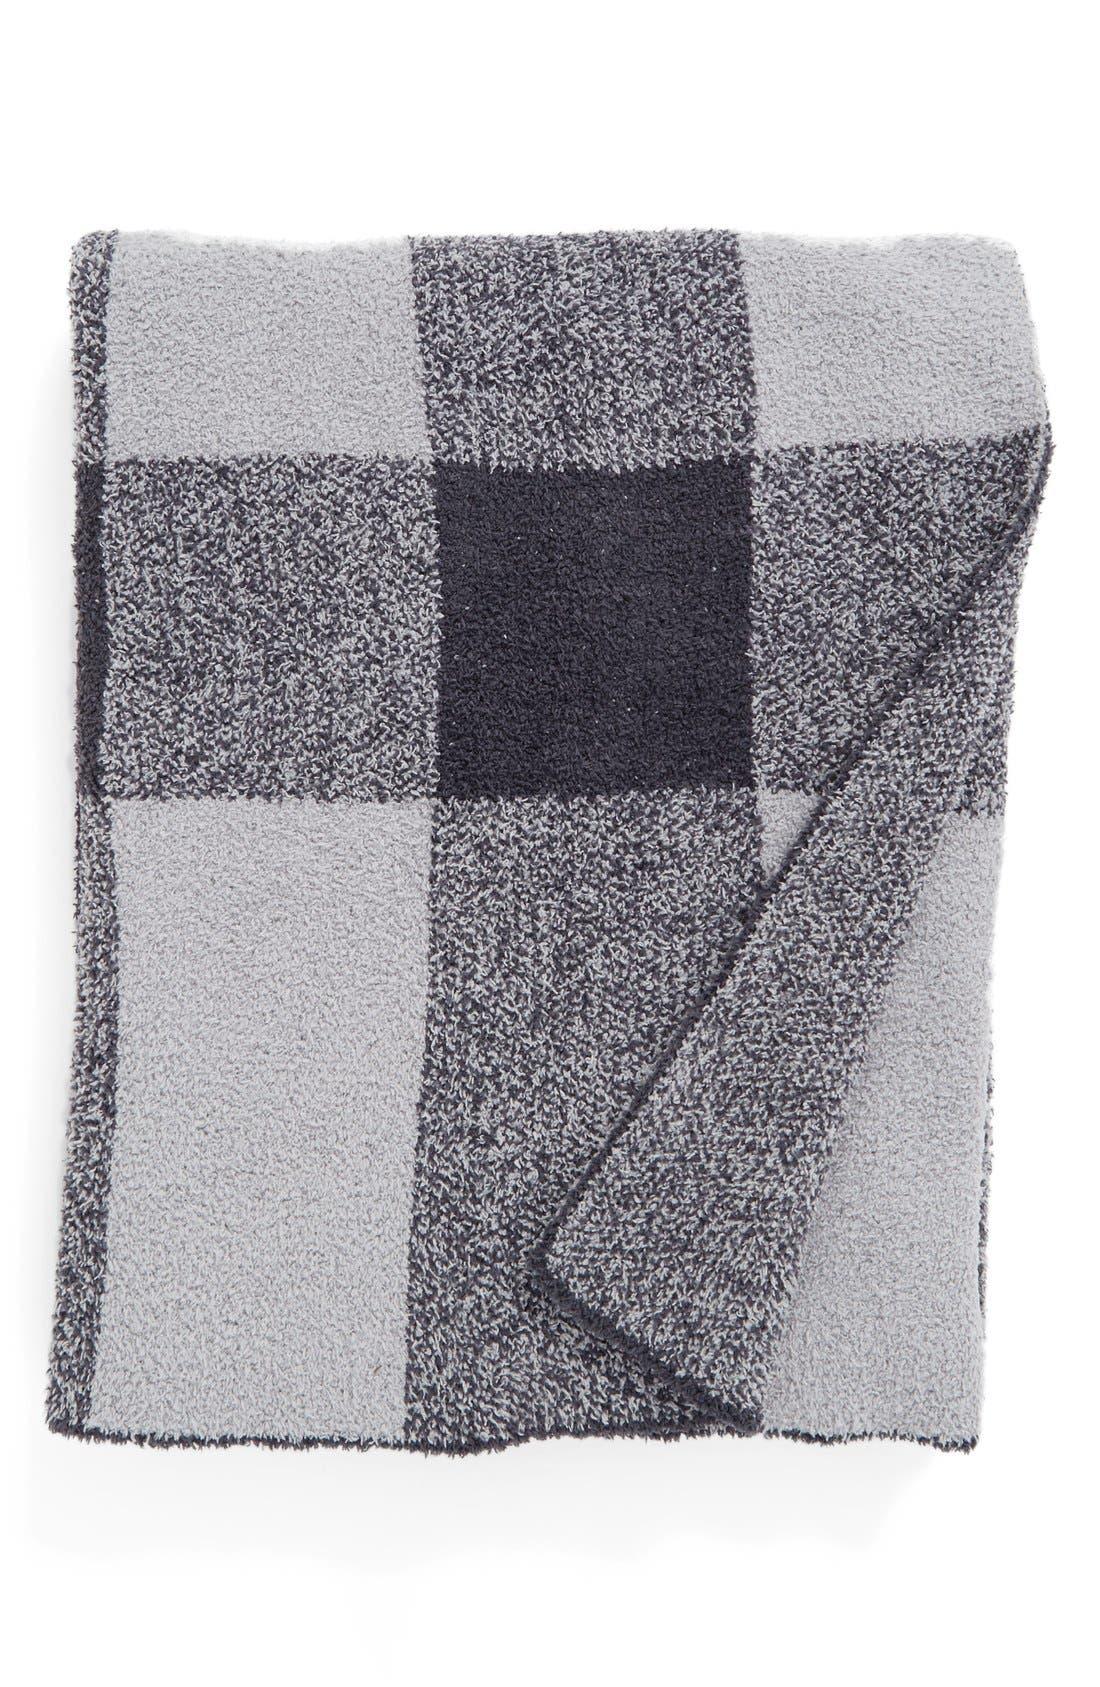 Barefoot Dreams® CozyChic® Plaid Throw Blanket